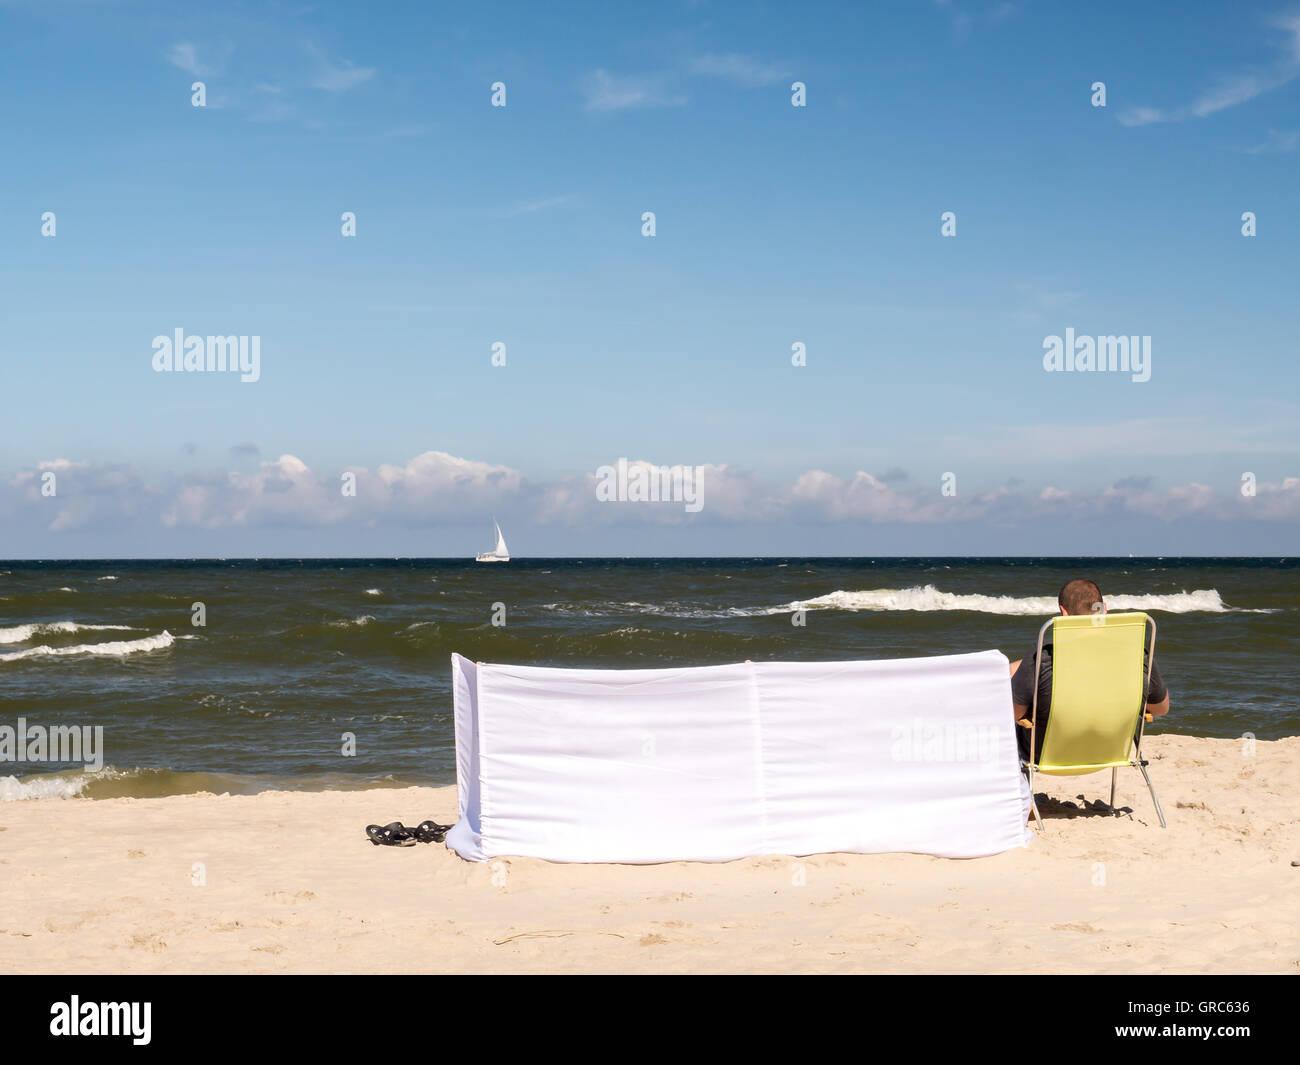 Relaxed sunbather sitting on yellow sunlonger next to white windbreak at the beach - Stock Image